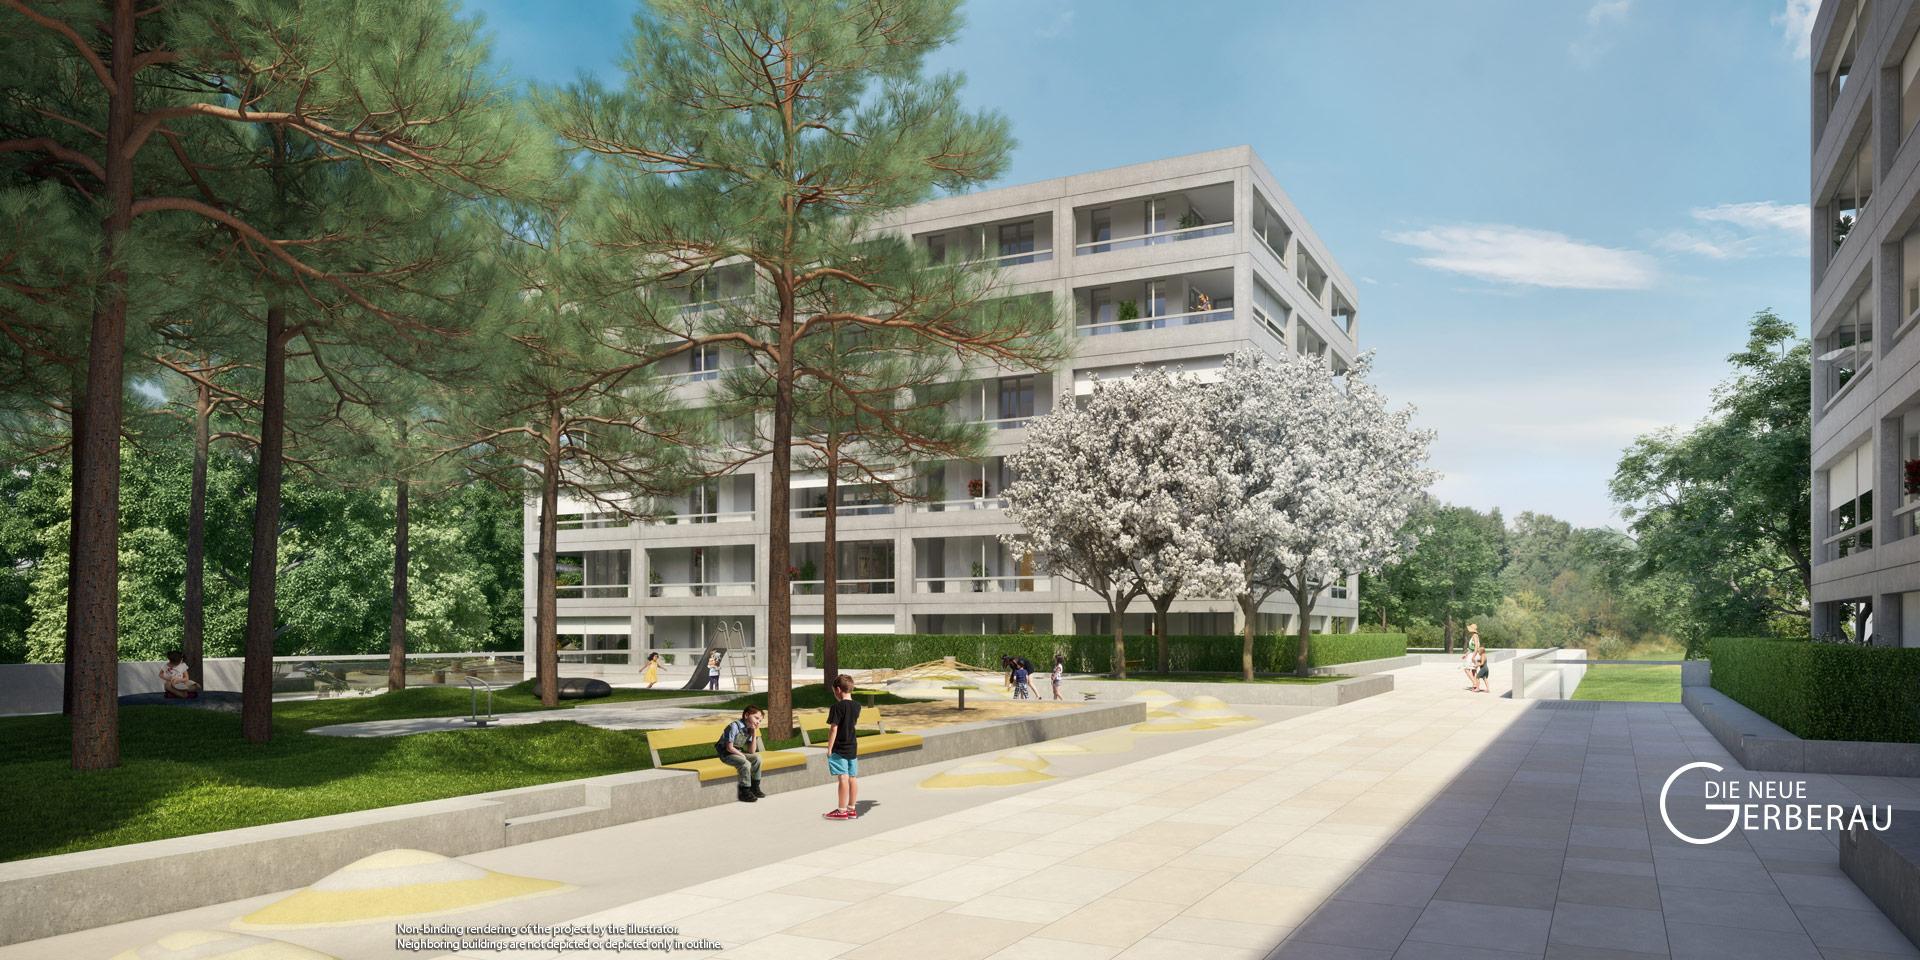 Property Munich: Die neue Gerberau